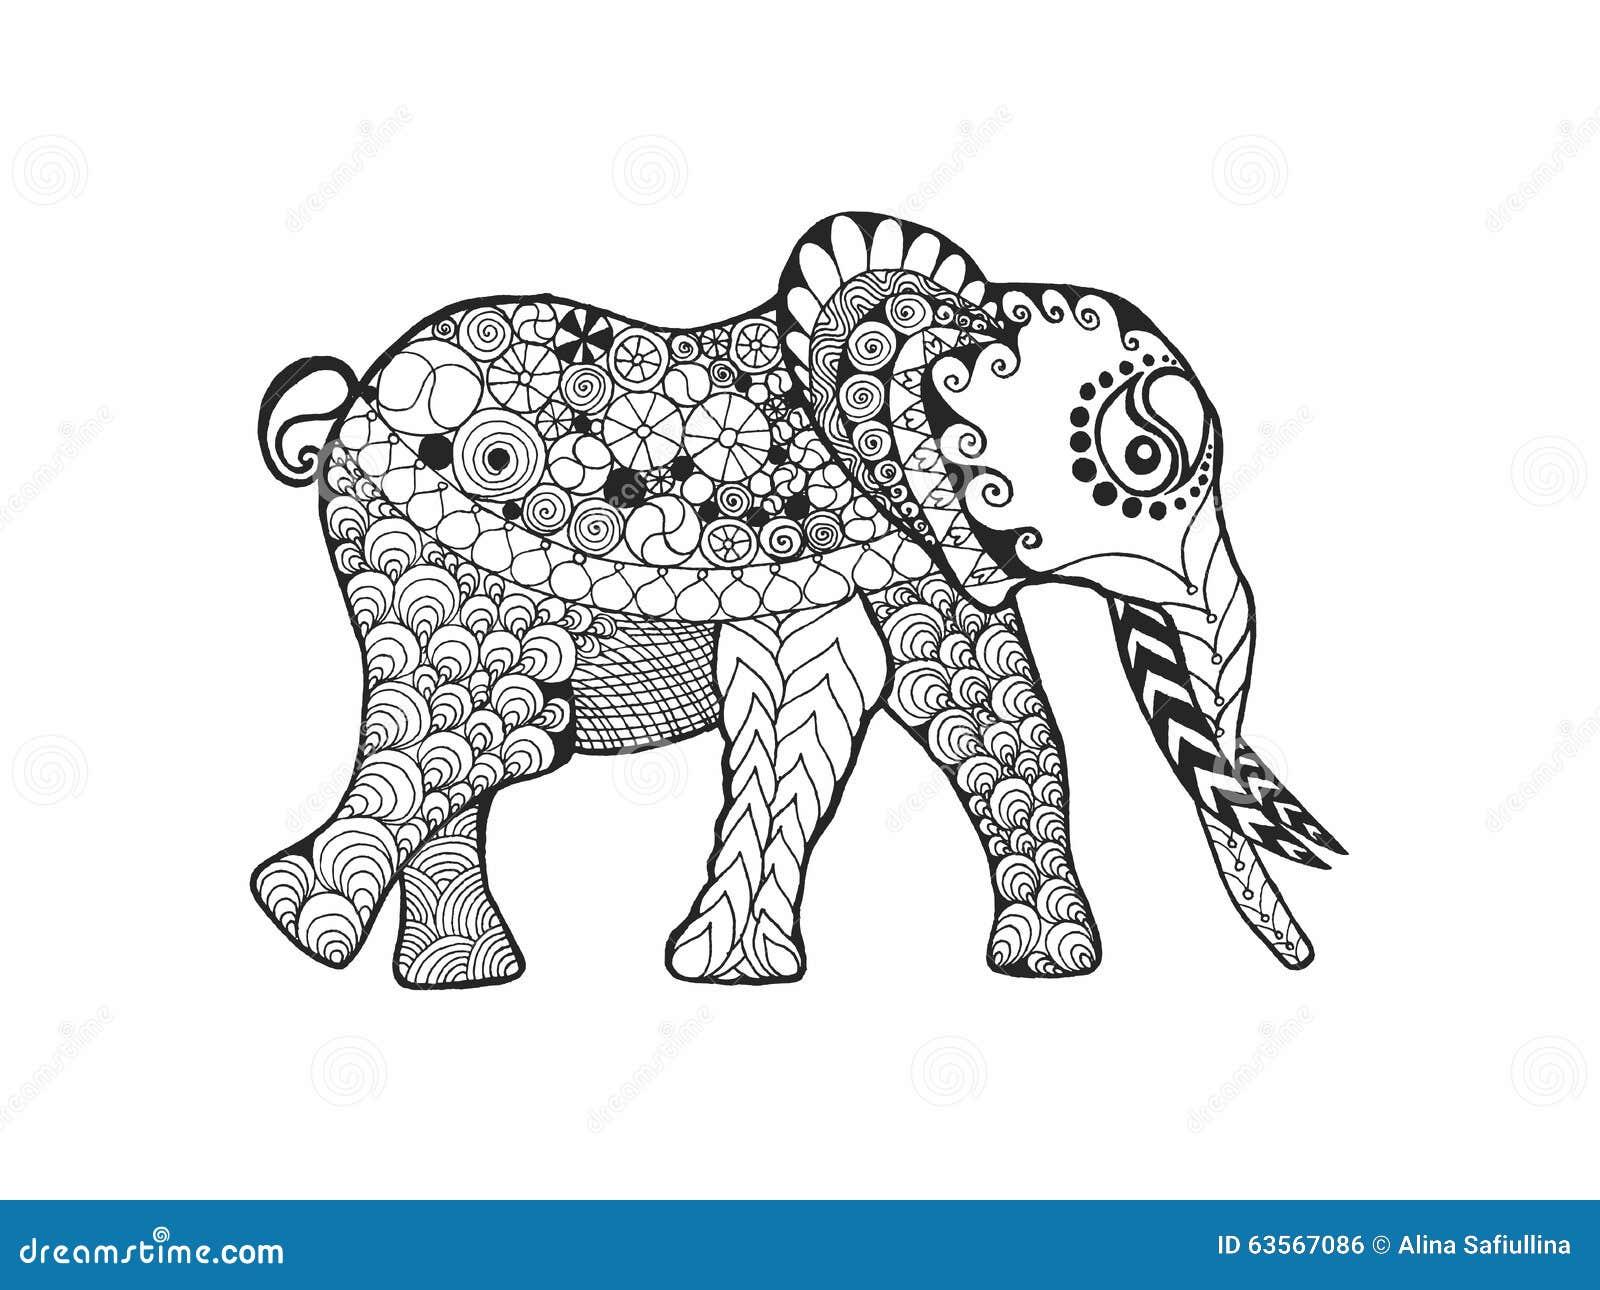 Elephant stock vector. Illustration of decoration, head ...